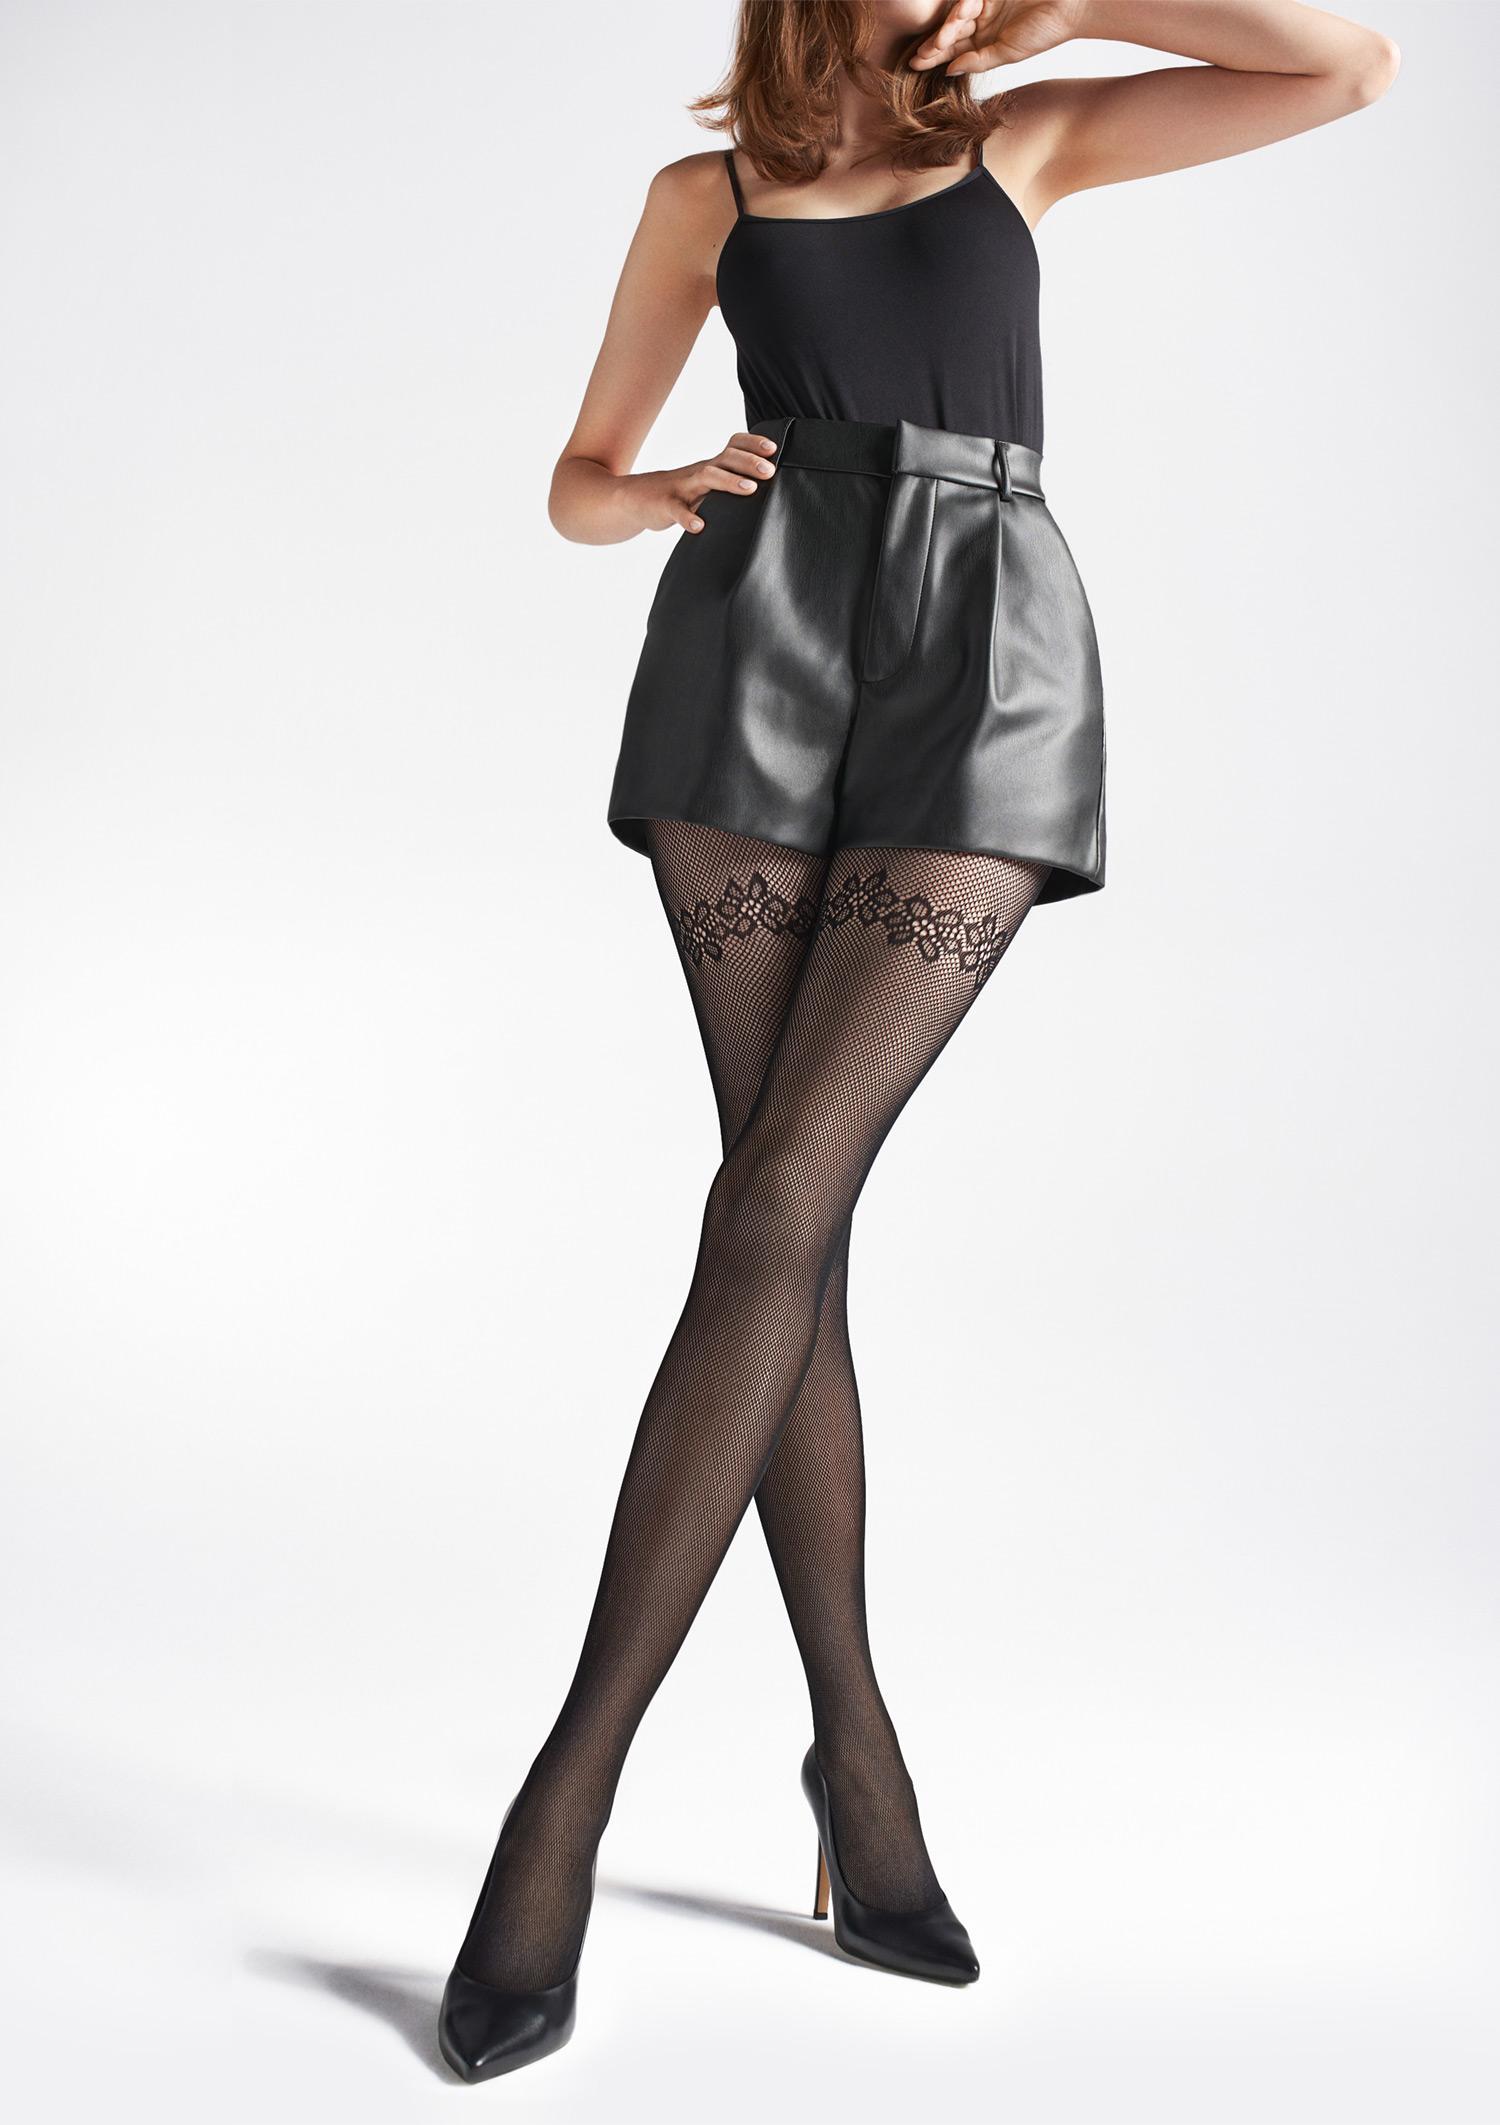 https://golden-legs.com.ua/images/stories/virtuemart/product/rajstopy-kabaretki-w-drobne-oczka-charly-u04-marilyn_1.jpg